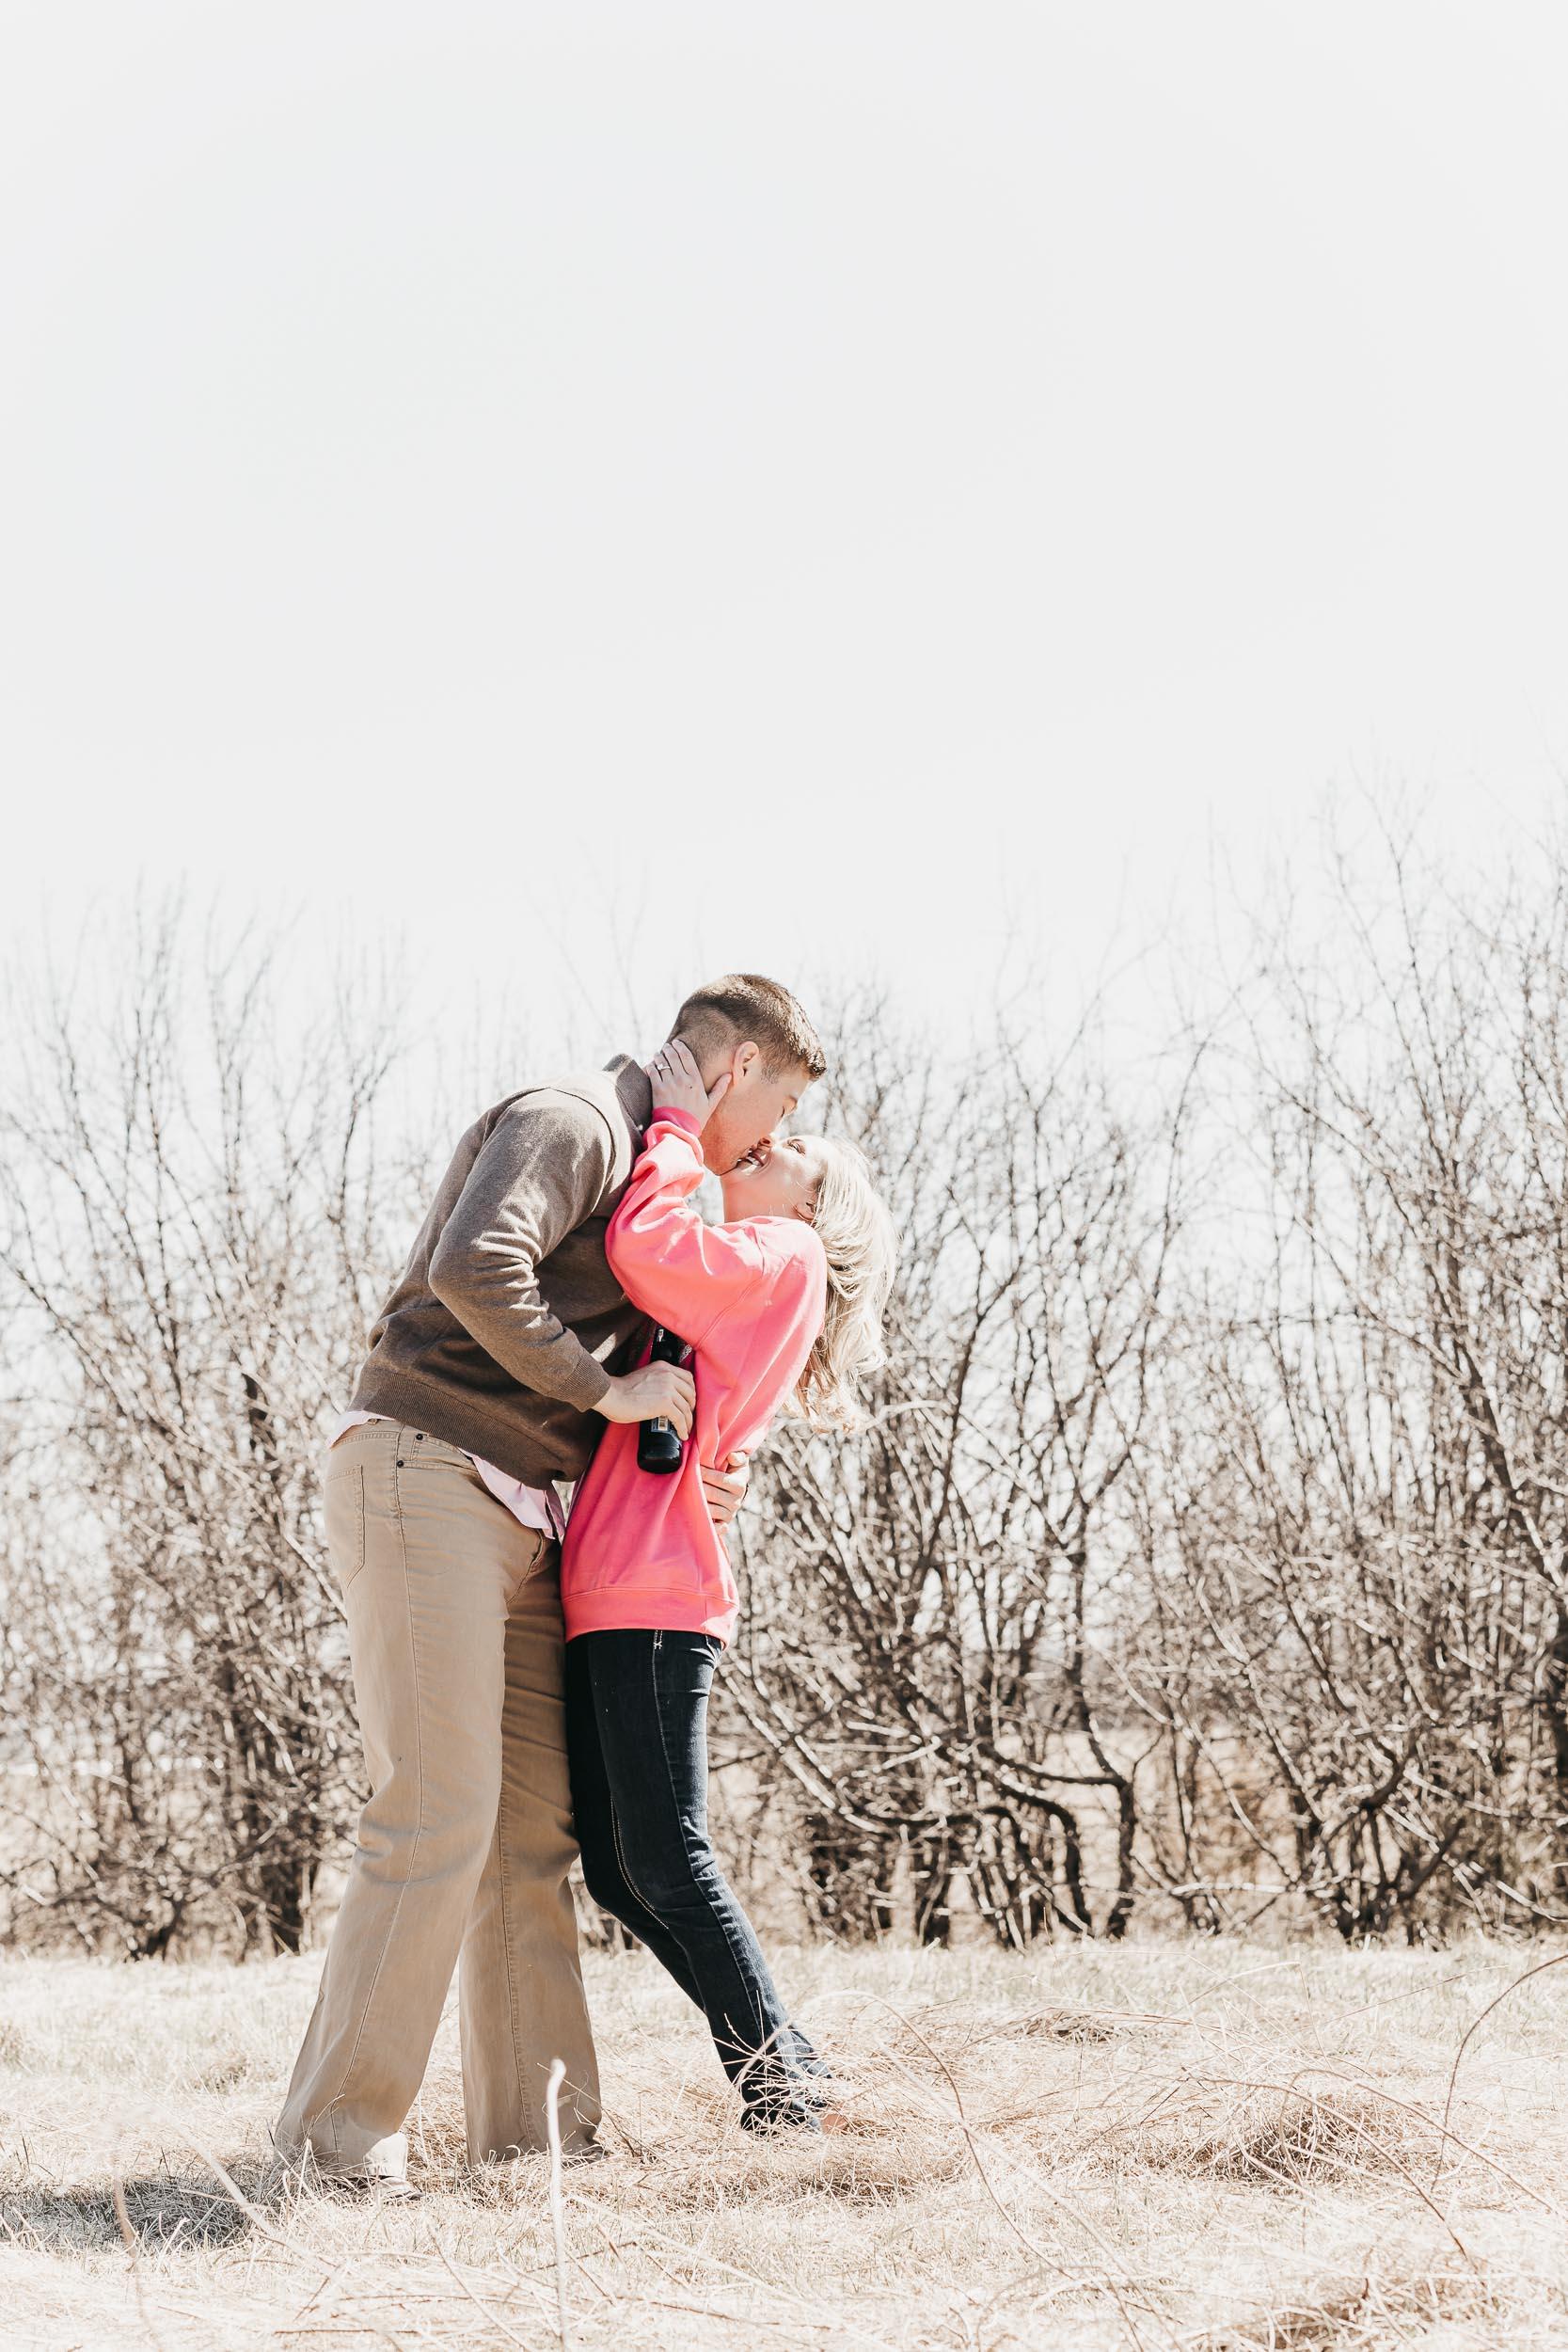 Ottawa-Elopement-Engagement-Photographer-7391.jpg